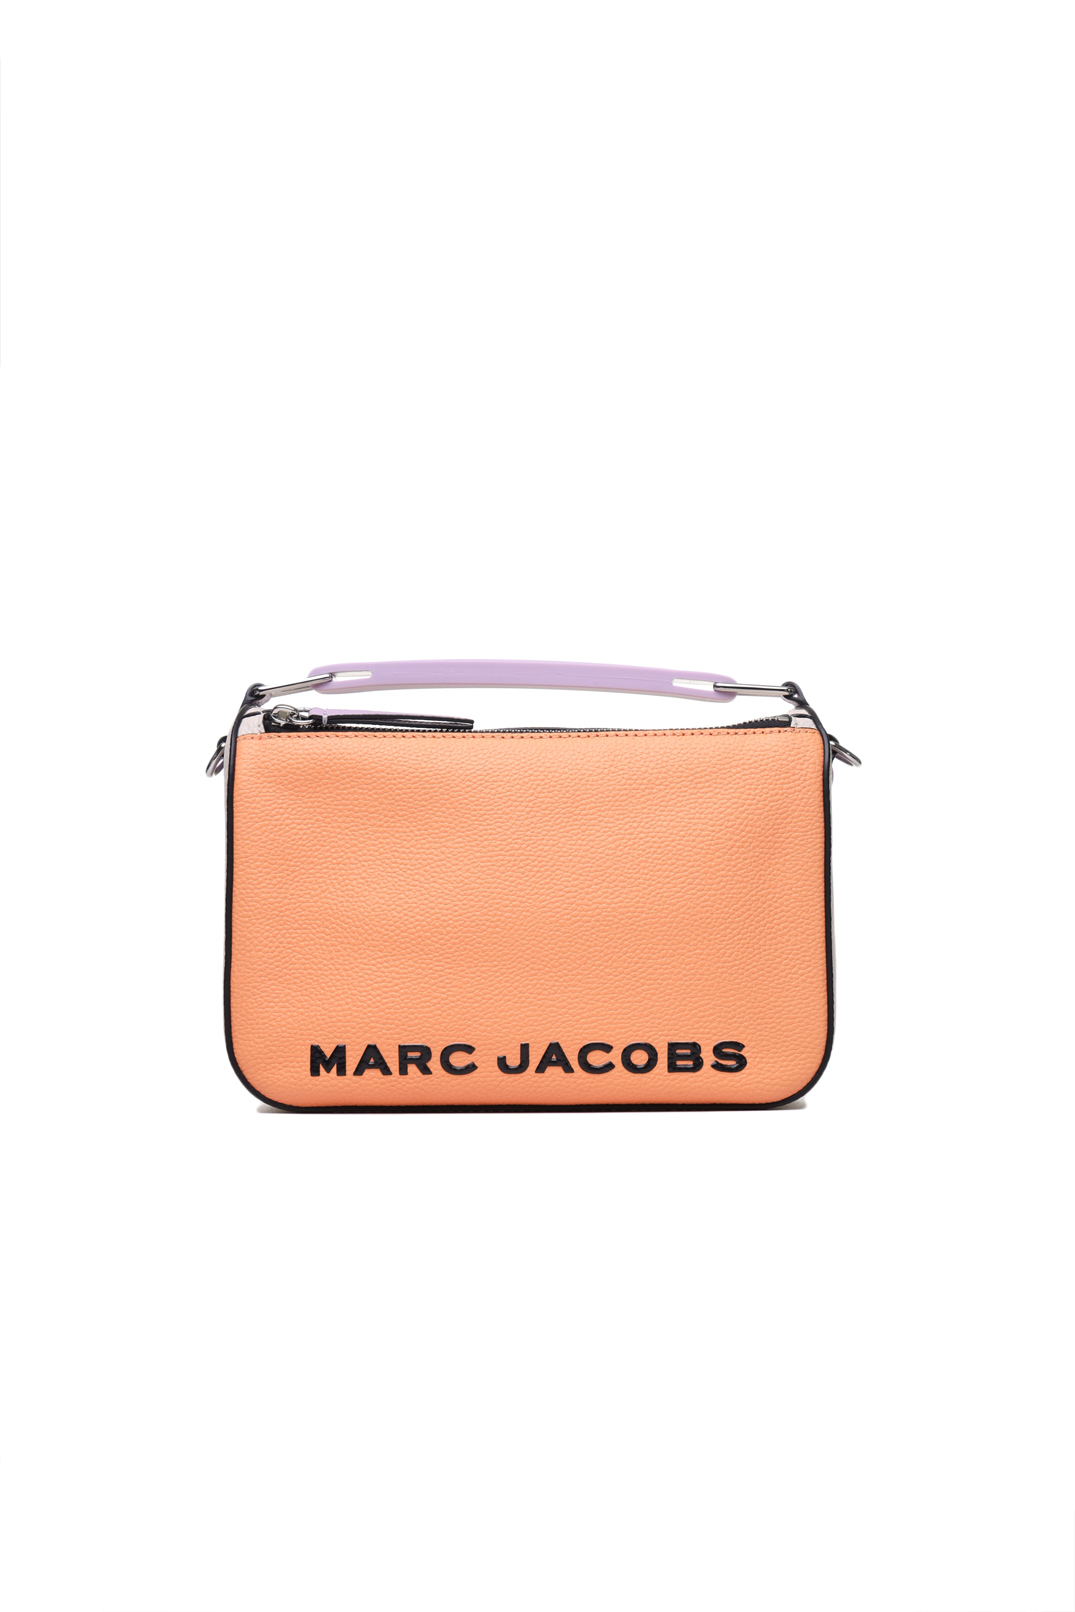 Cумка SOFTBOX MARC JACOBS MJw11019